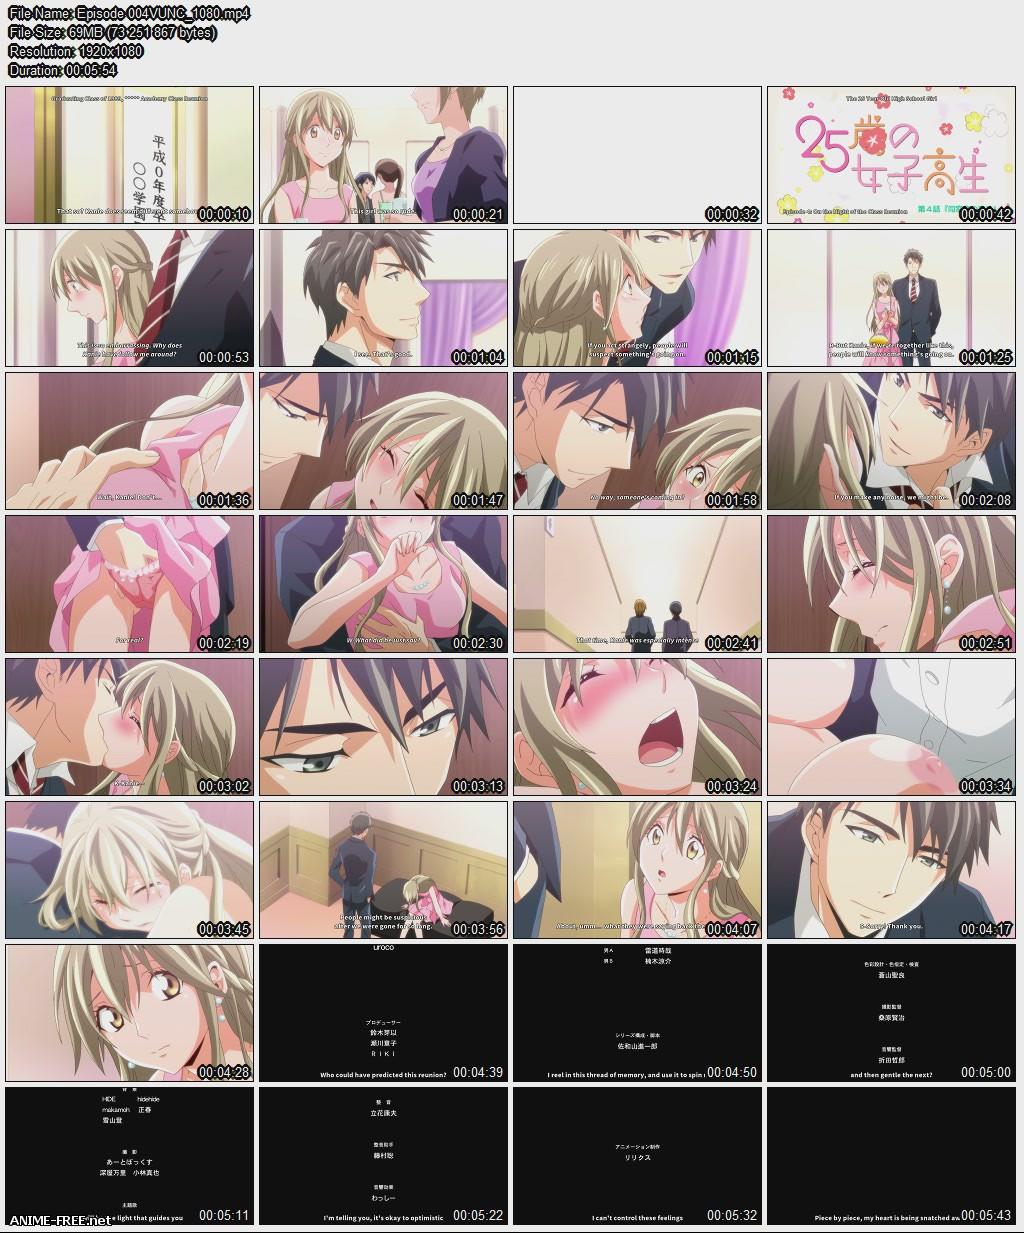 25-sai no joshikousei / 25-year-old high school girl / 25-летняя старшеклассница [OVA] [2018] [Ep.1-12] [HD-1080p] [ENG,JAP] Ecchi